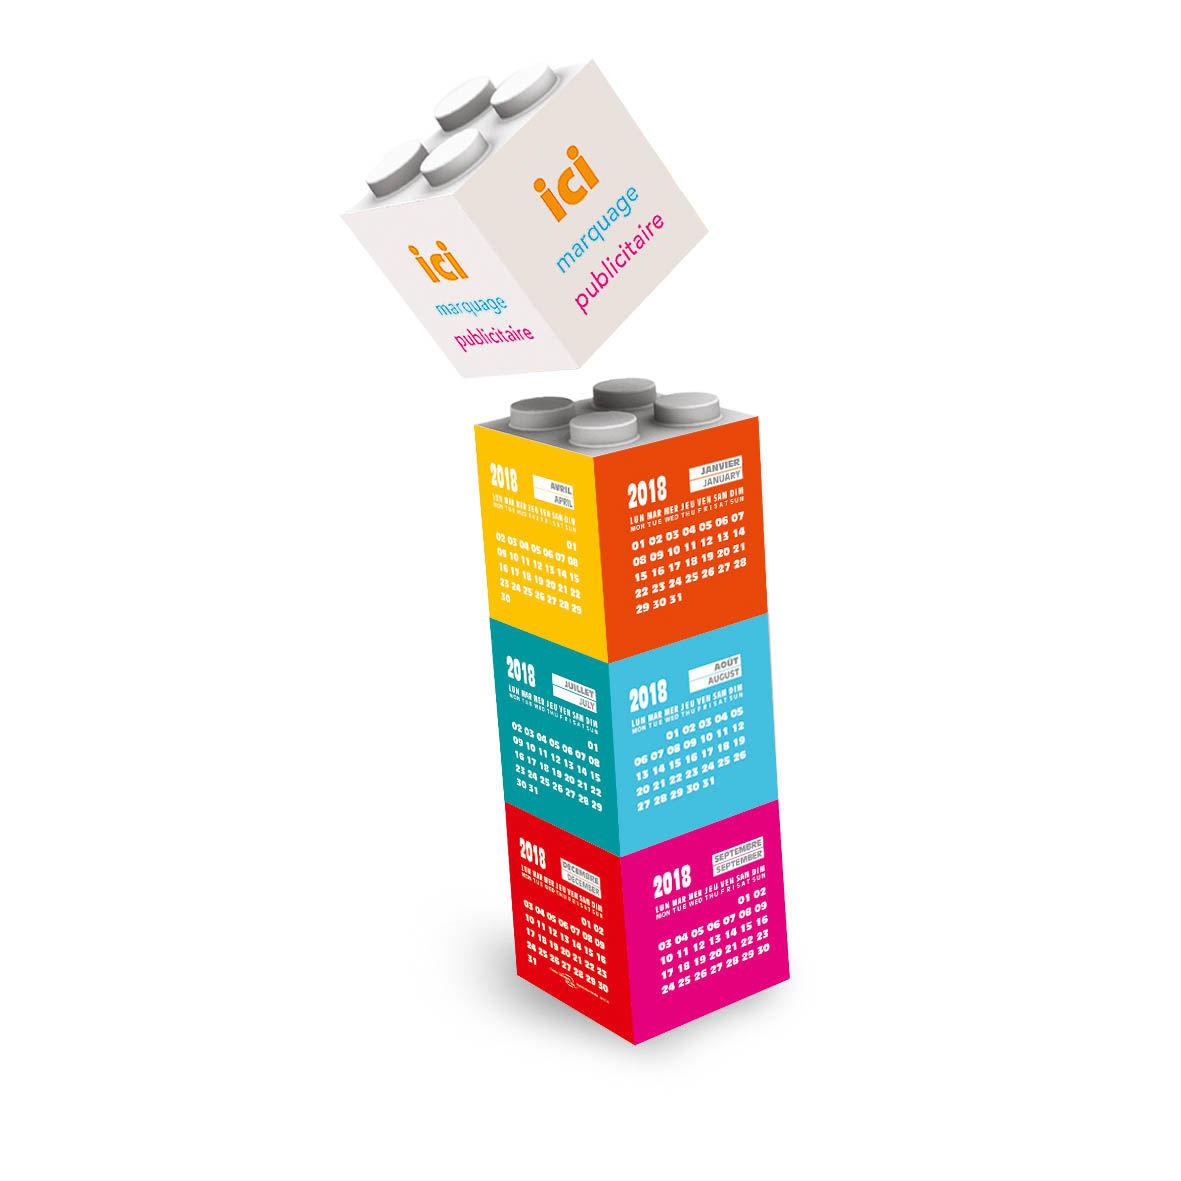 Calendrier Personnaliser.Calendrier Personnalise Blocks Construction Calendriers